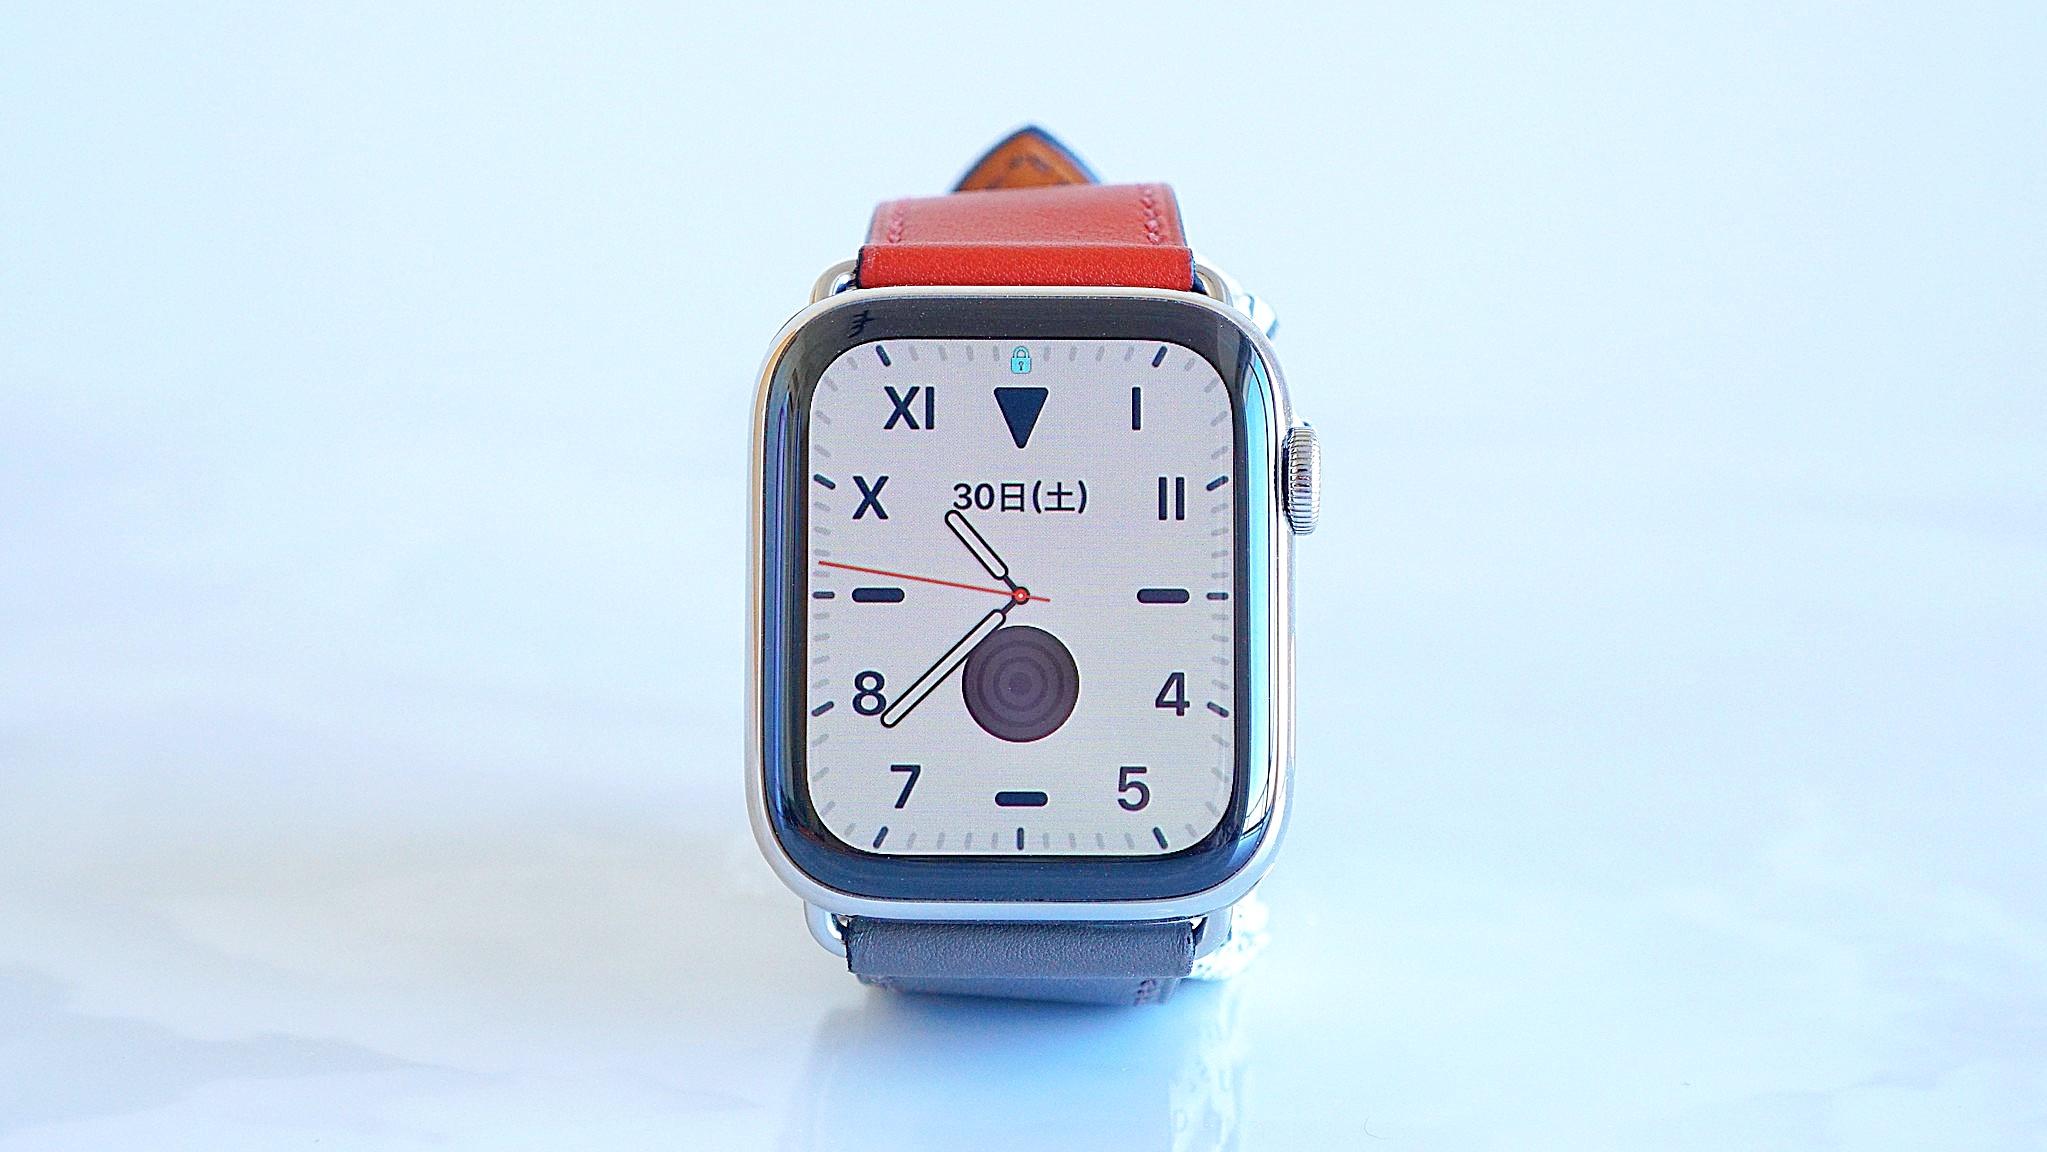 Apple Watch Hermès ヴォー・スウィフト(ノワール/ブリック/エタン) シンプルトゥールレザーストラップ レビュー